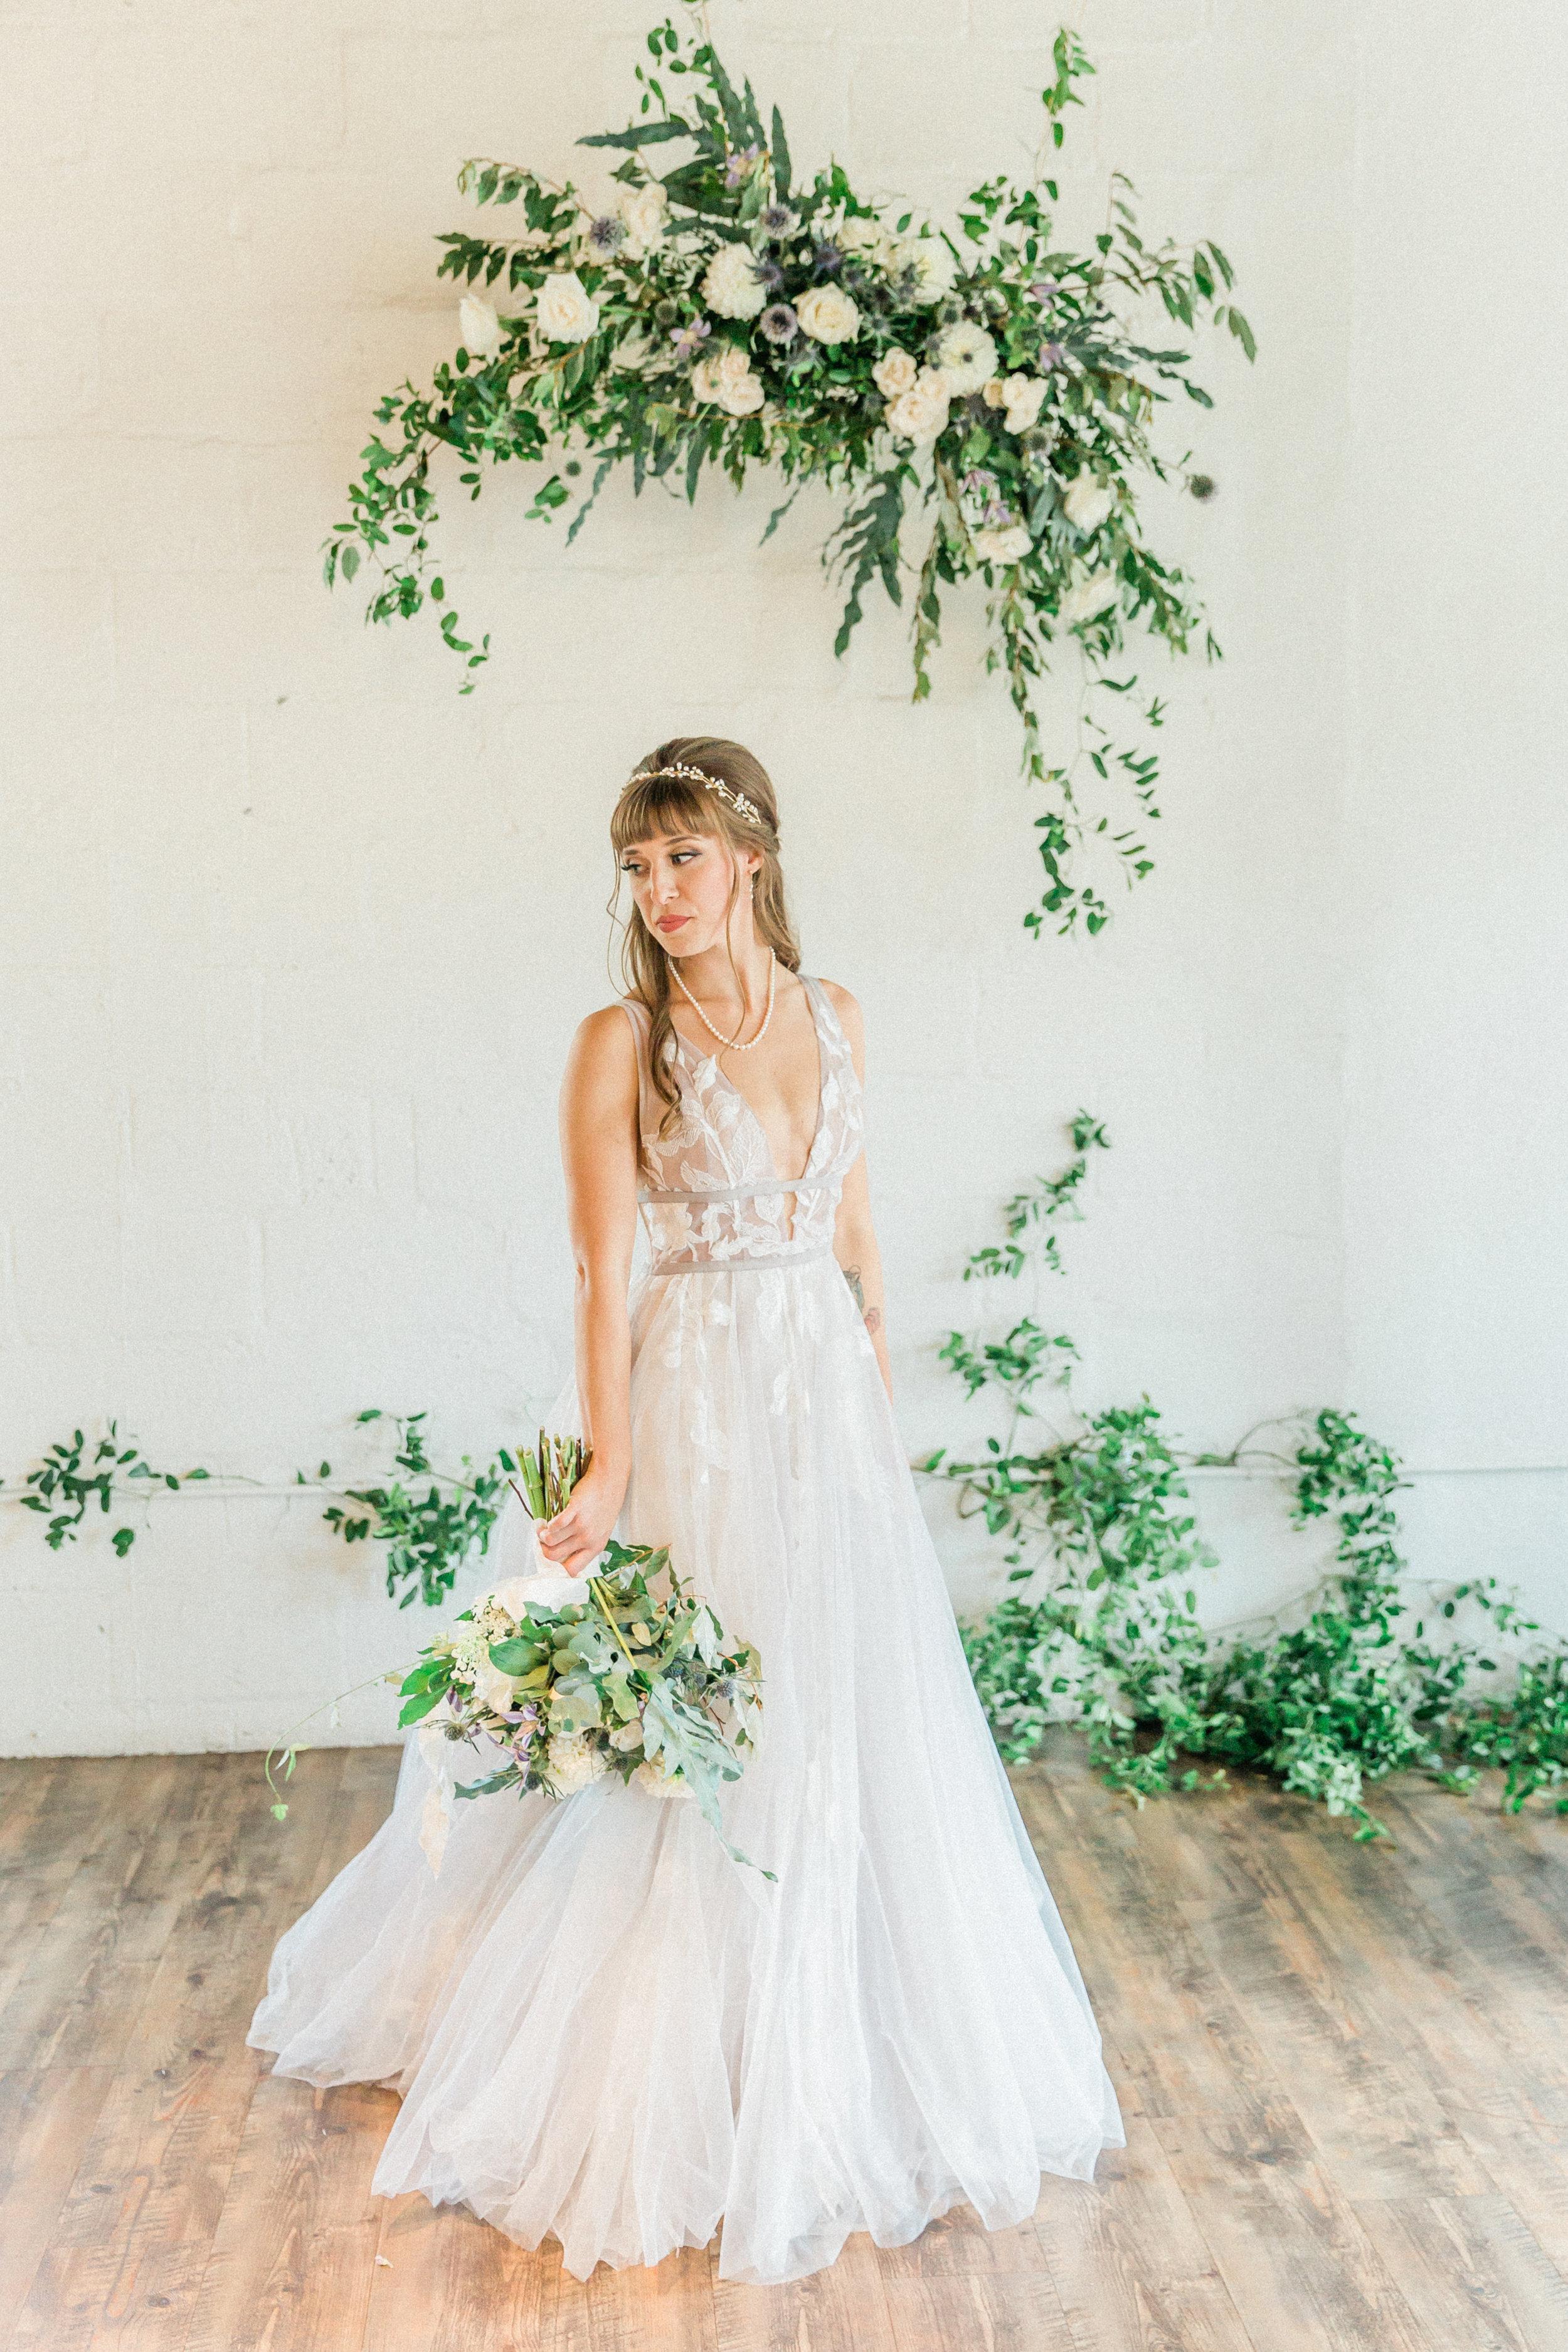 Mallory and Aaron - Married - Sneaks - Lauren Alisse Photography-49.jpg